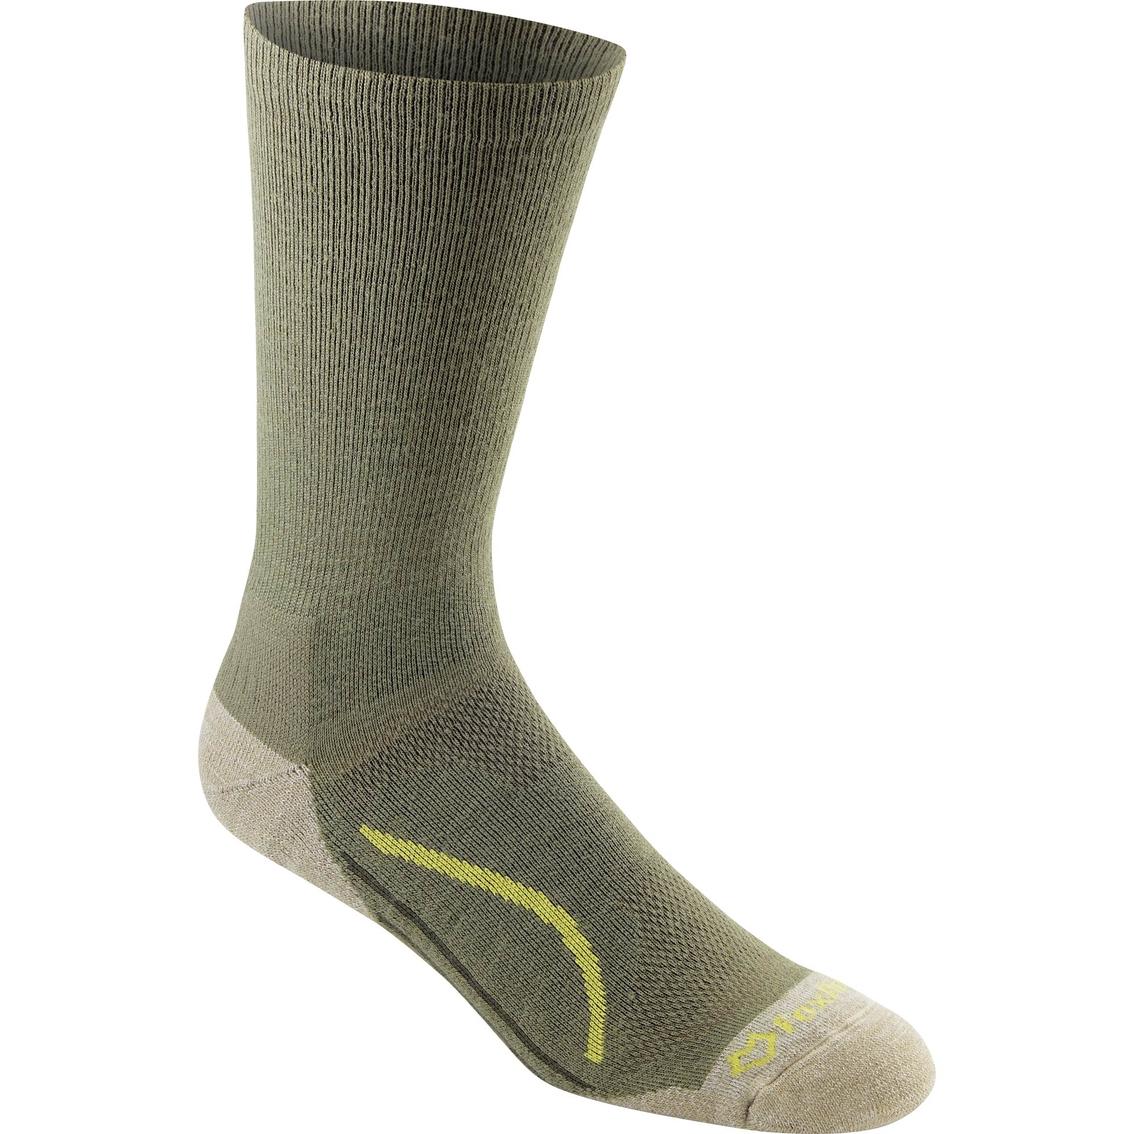 40b88866a18 Fox River Basecamp Crew Socks